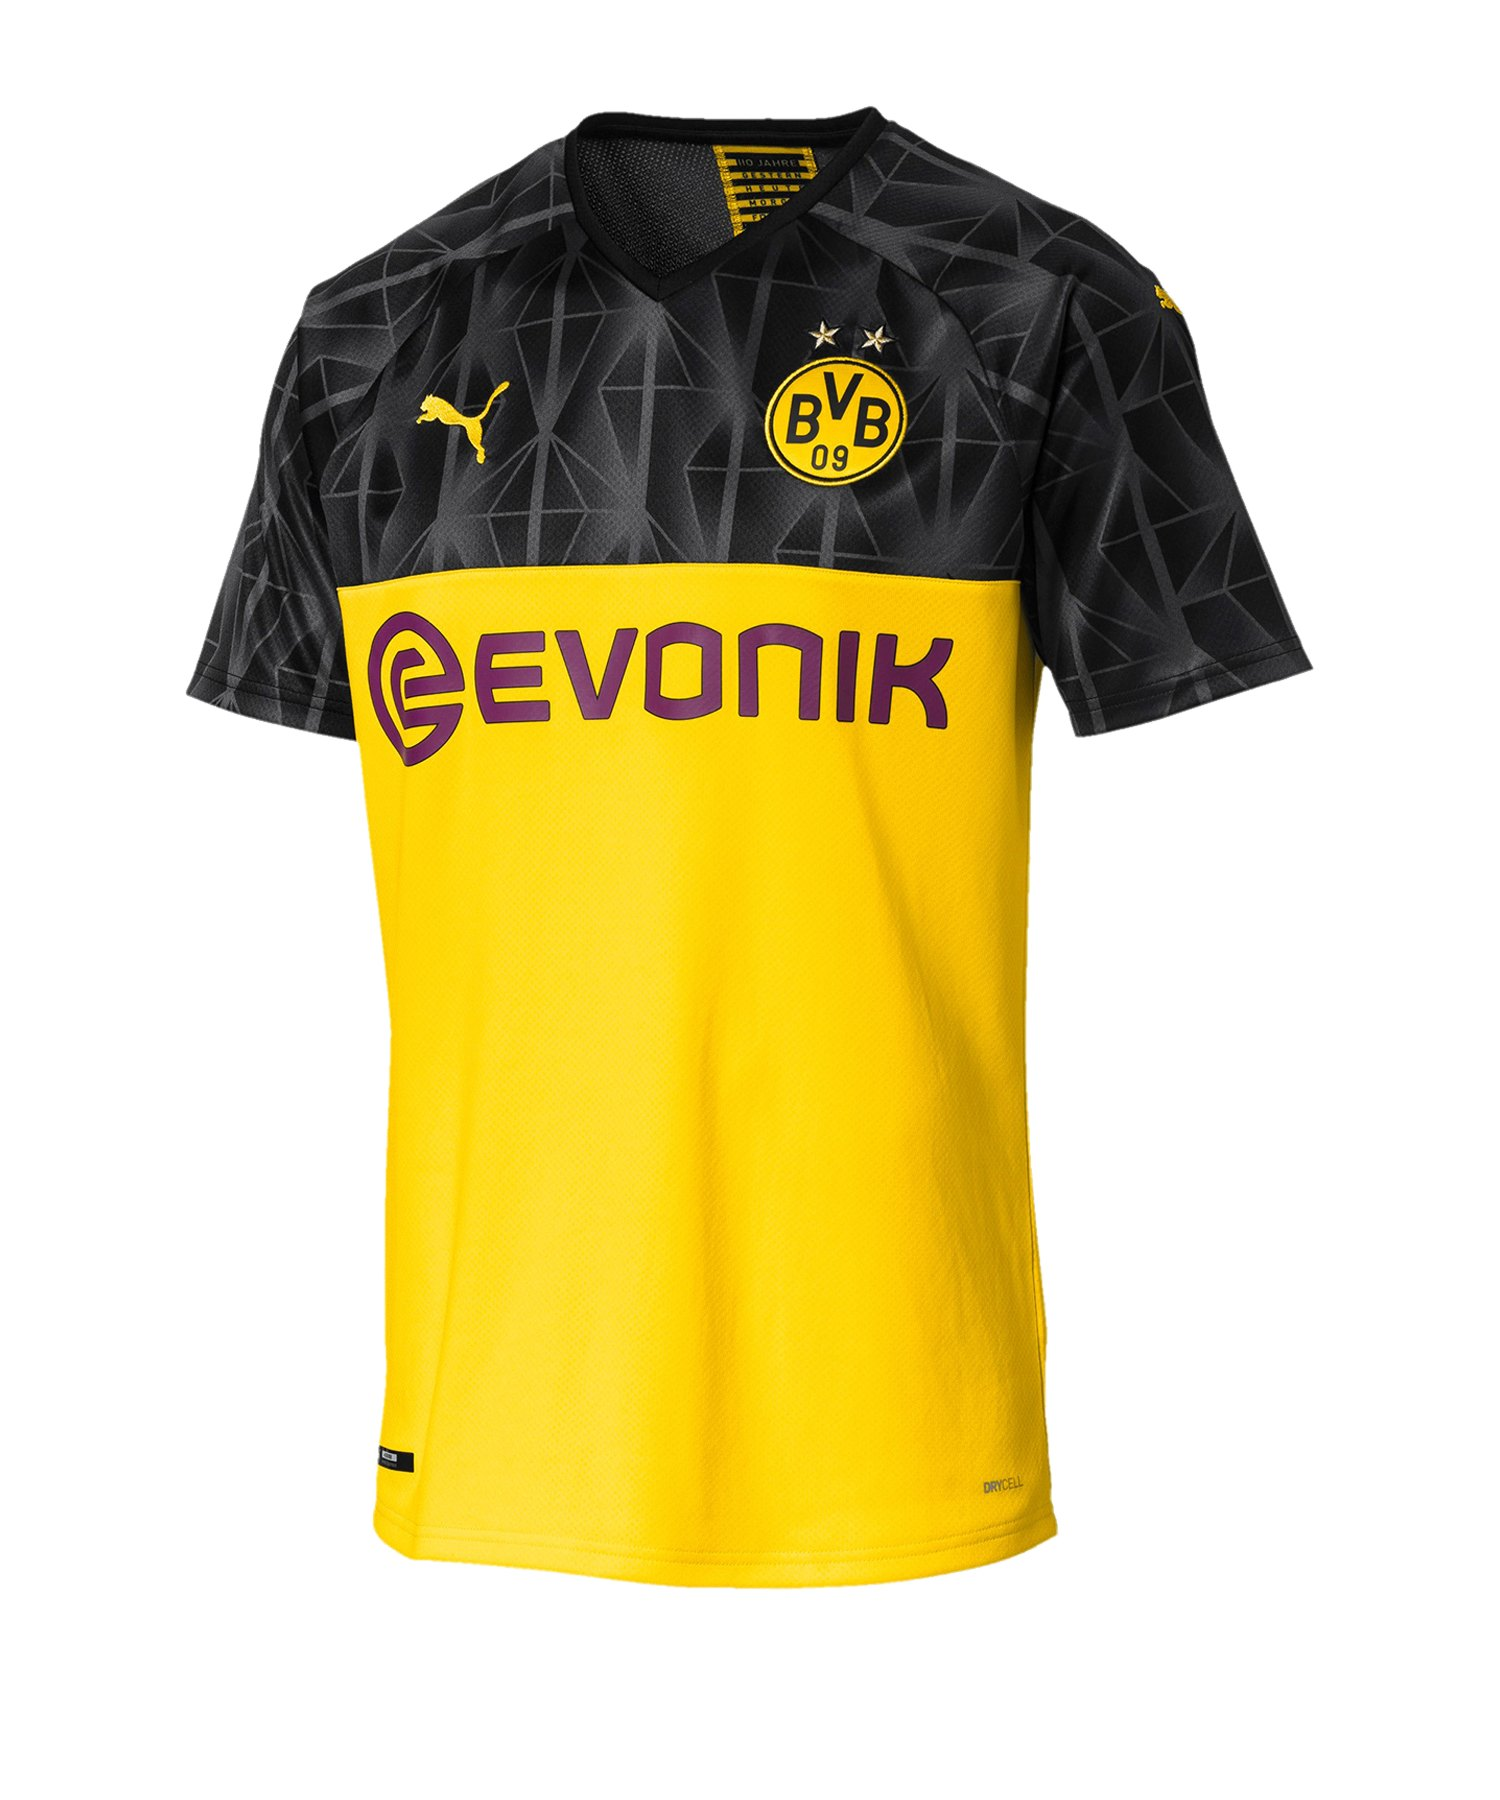 PUMA BVB Dortmund Trikot UCL 2019/2020 Gelb F11 - Gelb